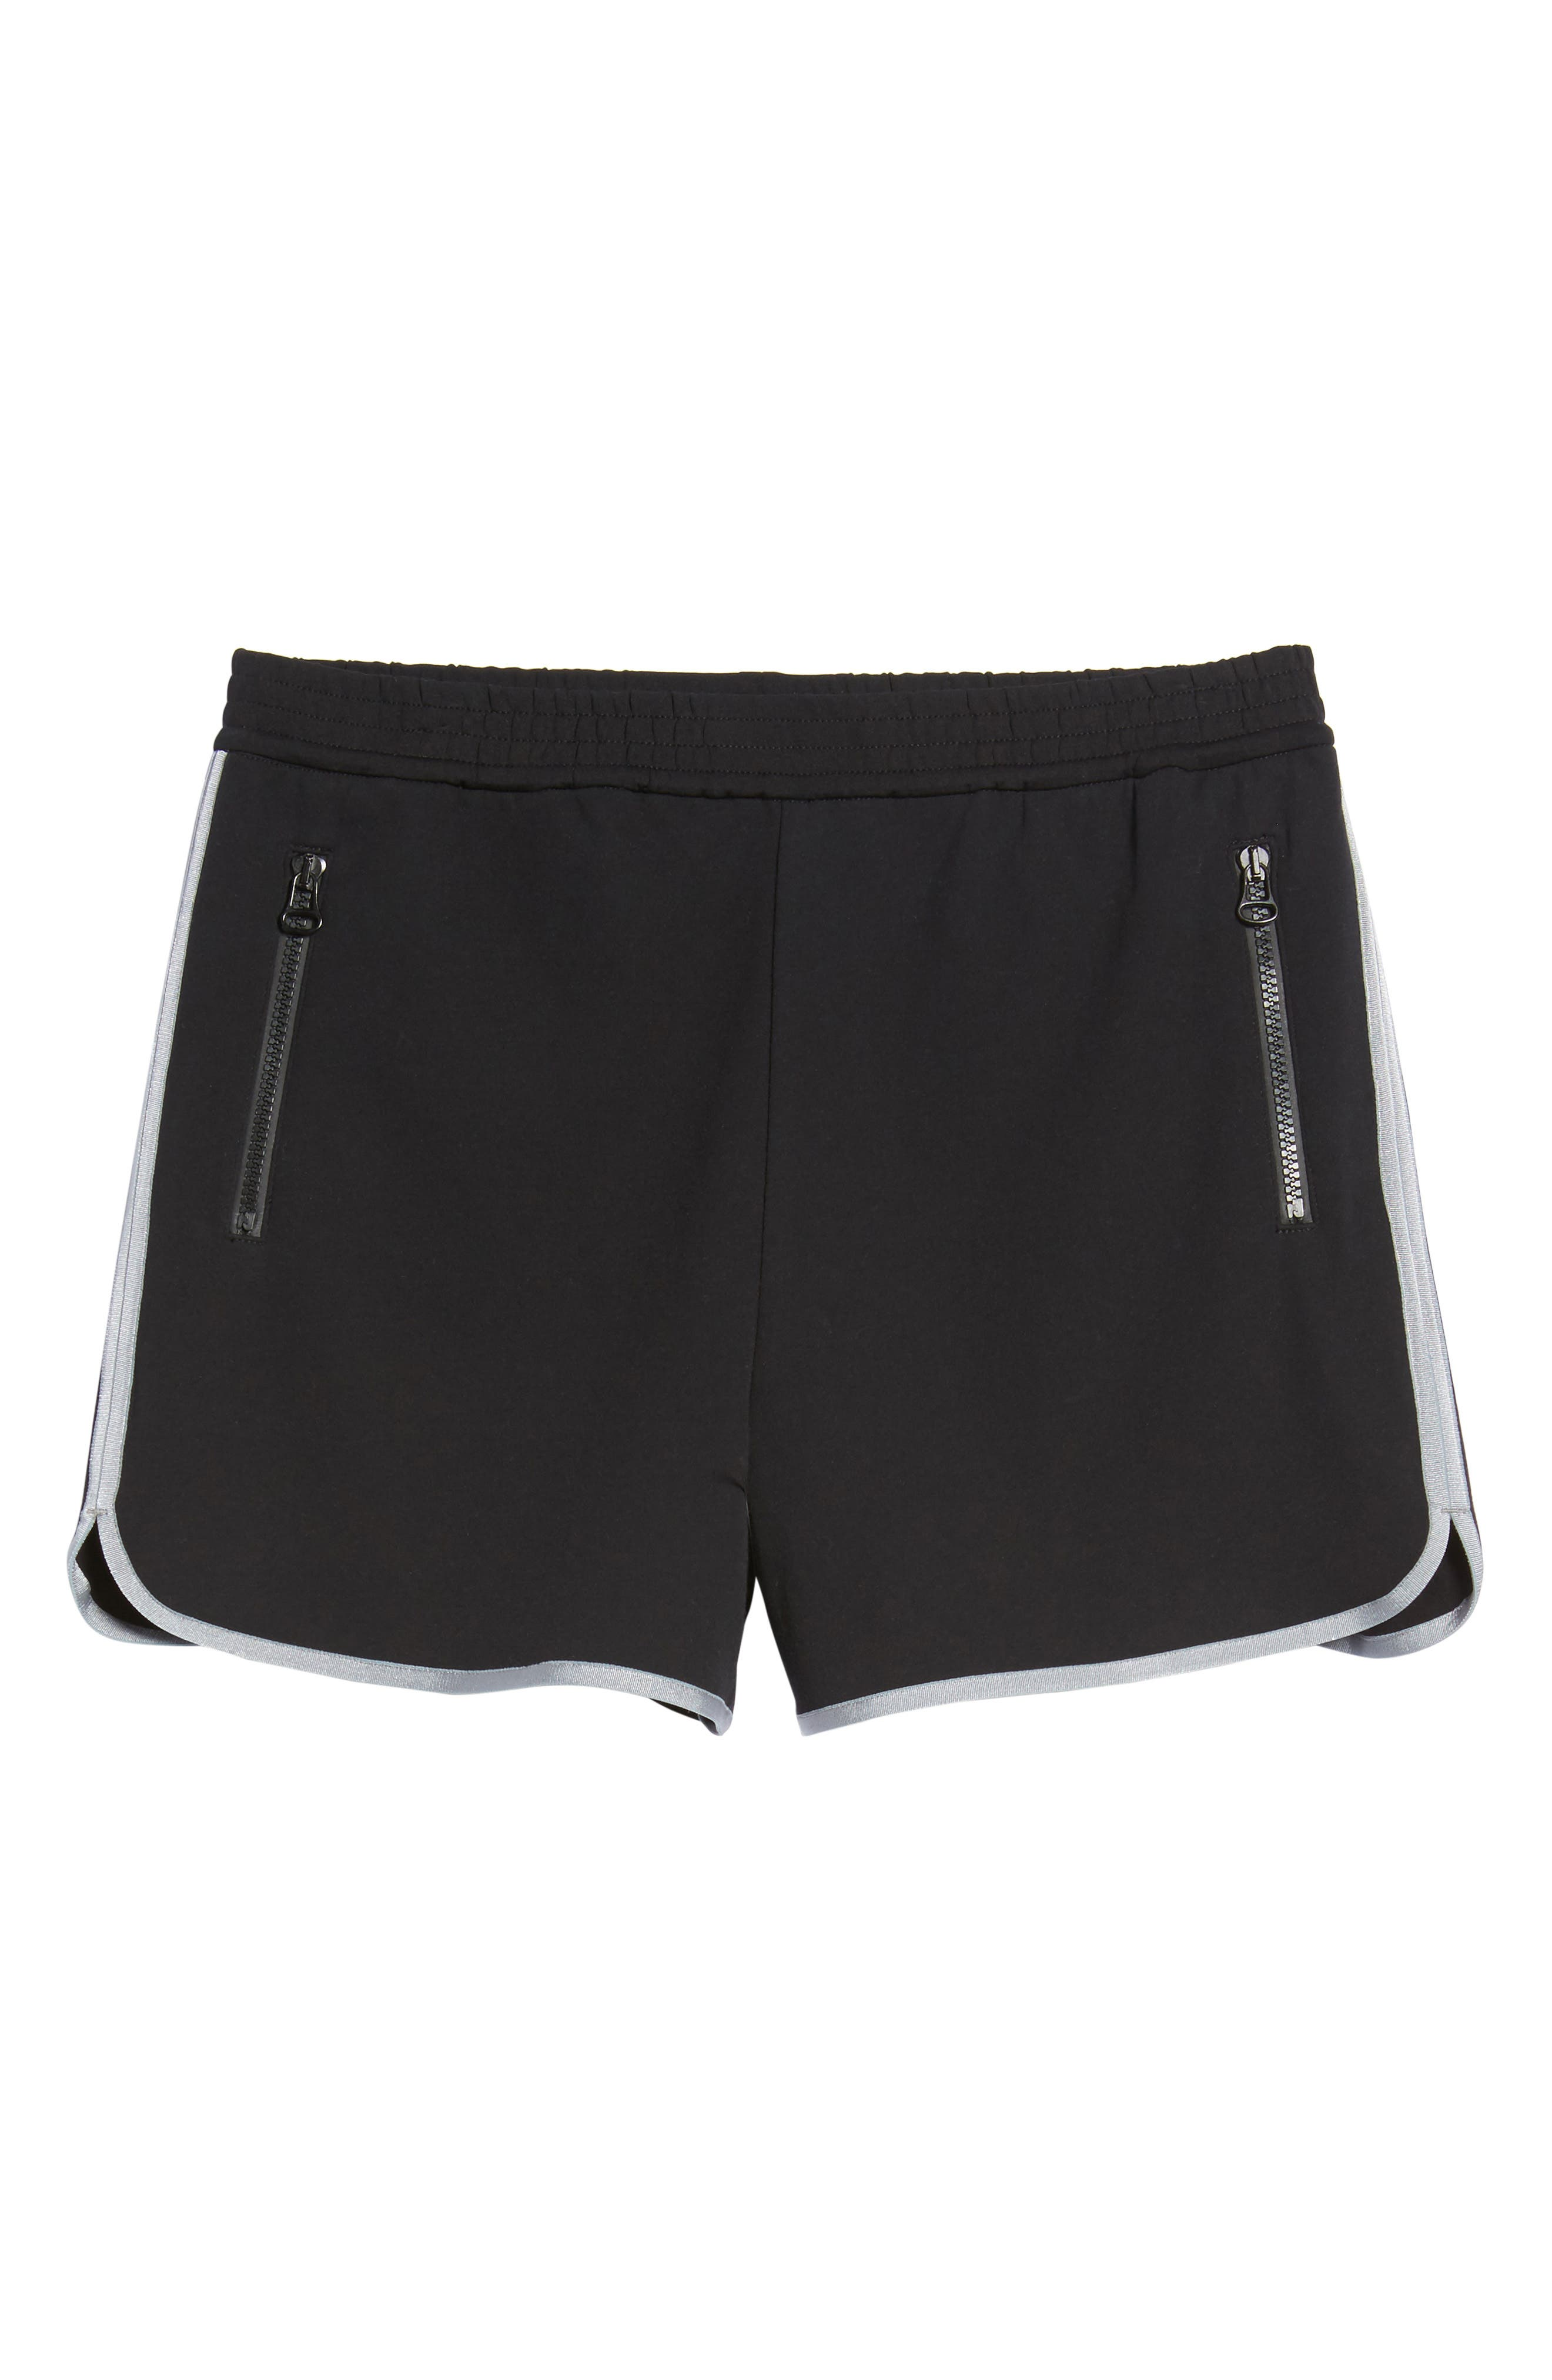 Gym Shorts,                             Alternate thumbnail 6, color,                             Black